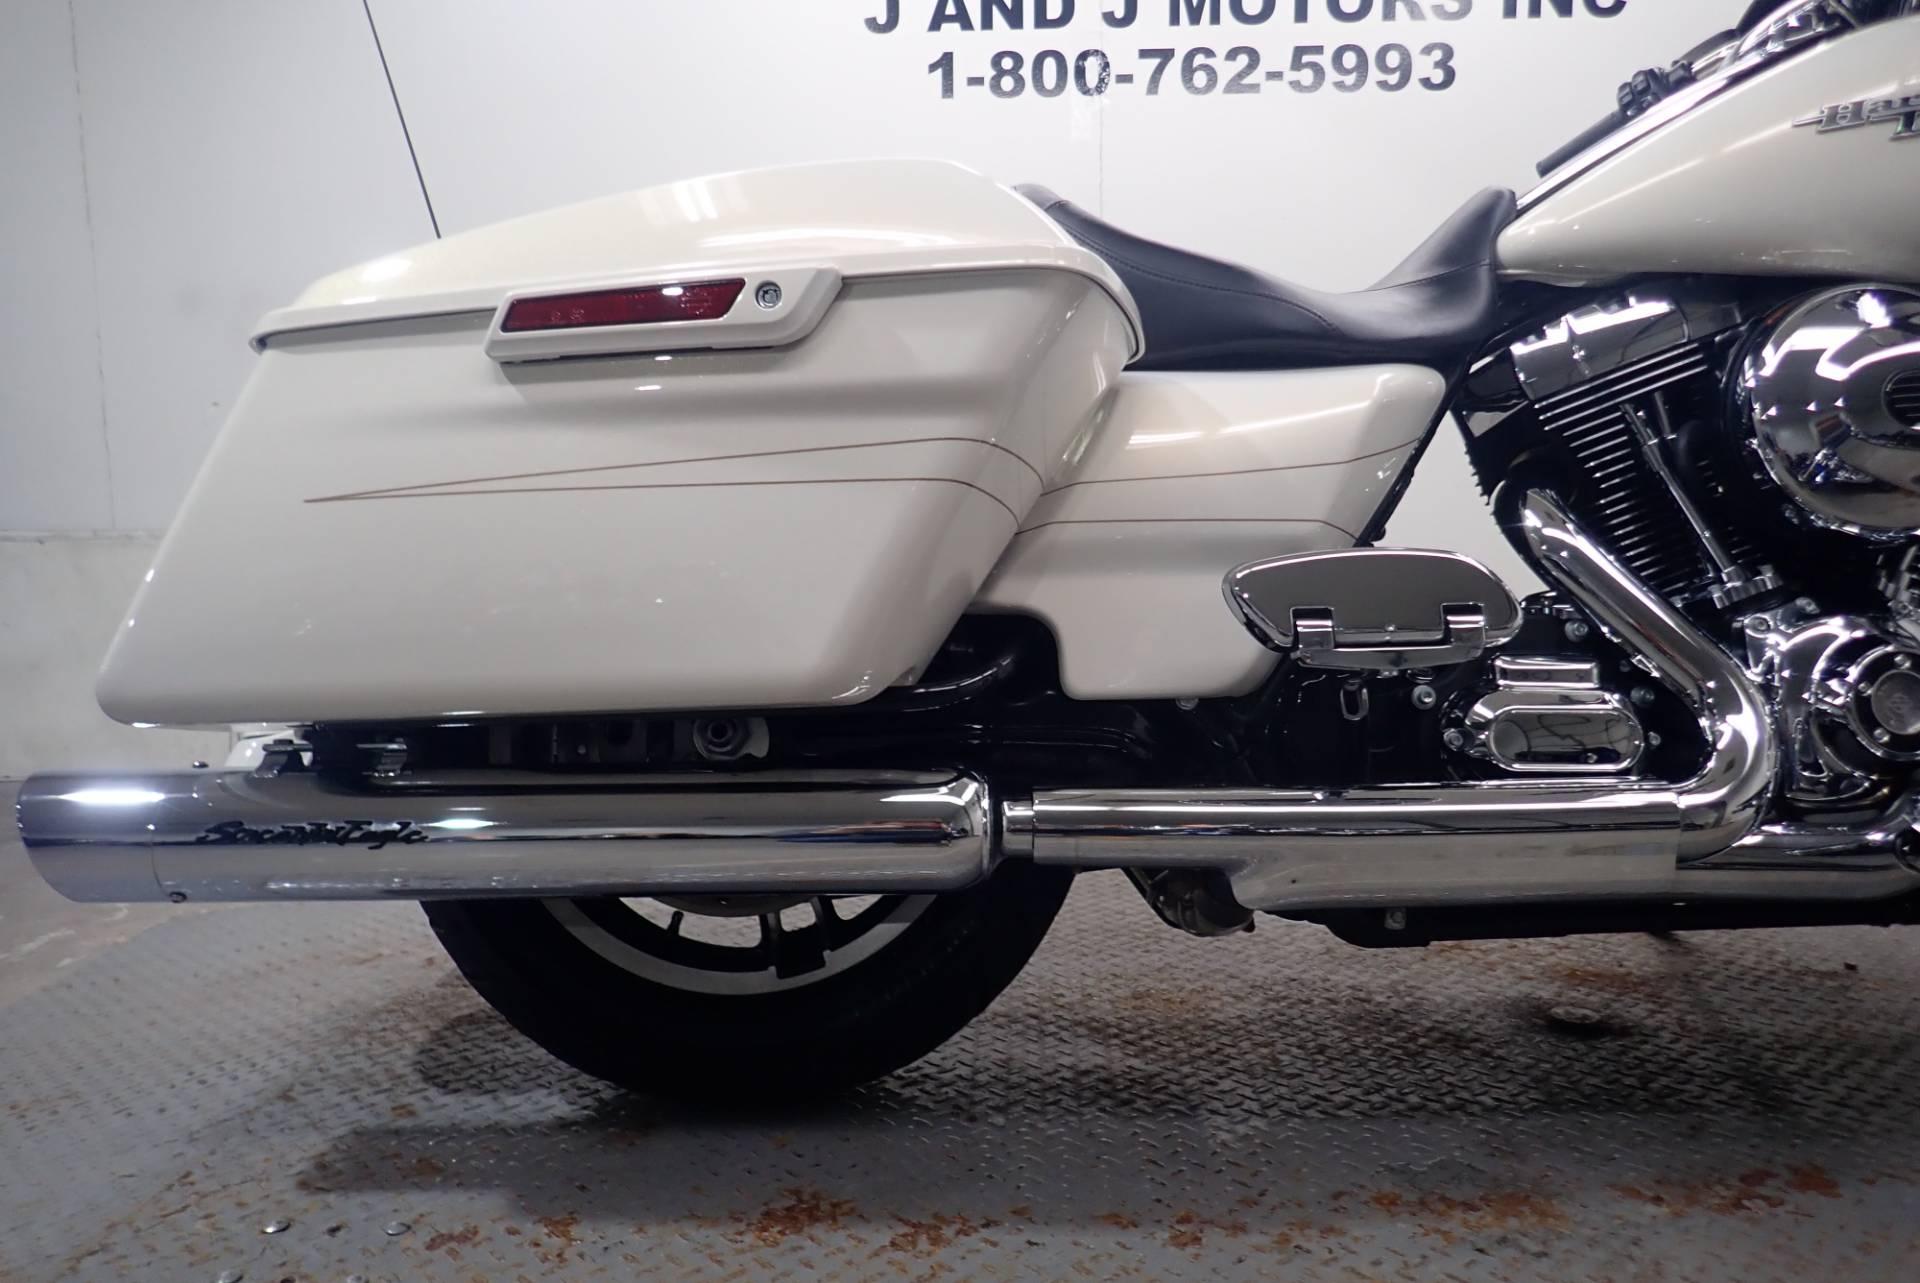 2015 Harley-Davidson Street Glide Special 5